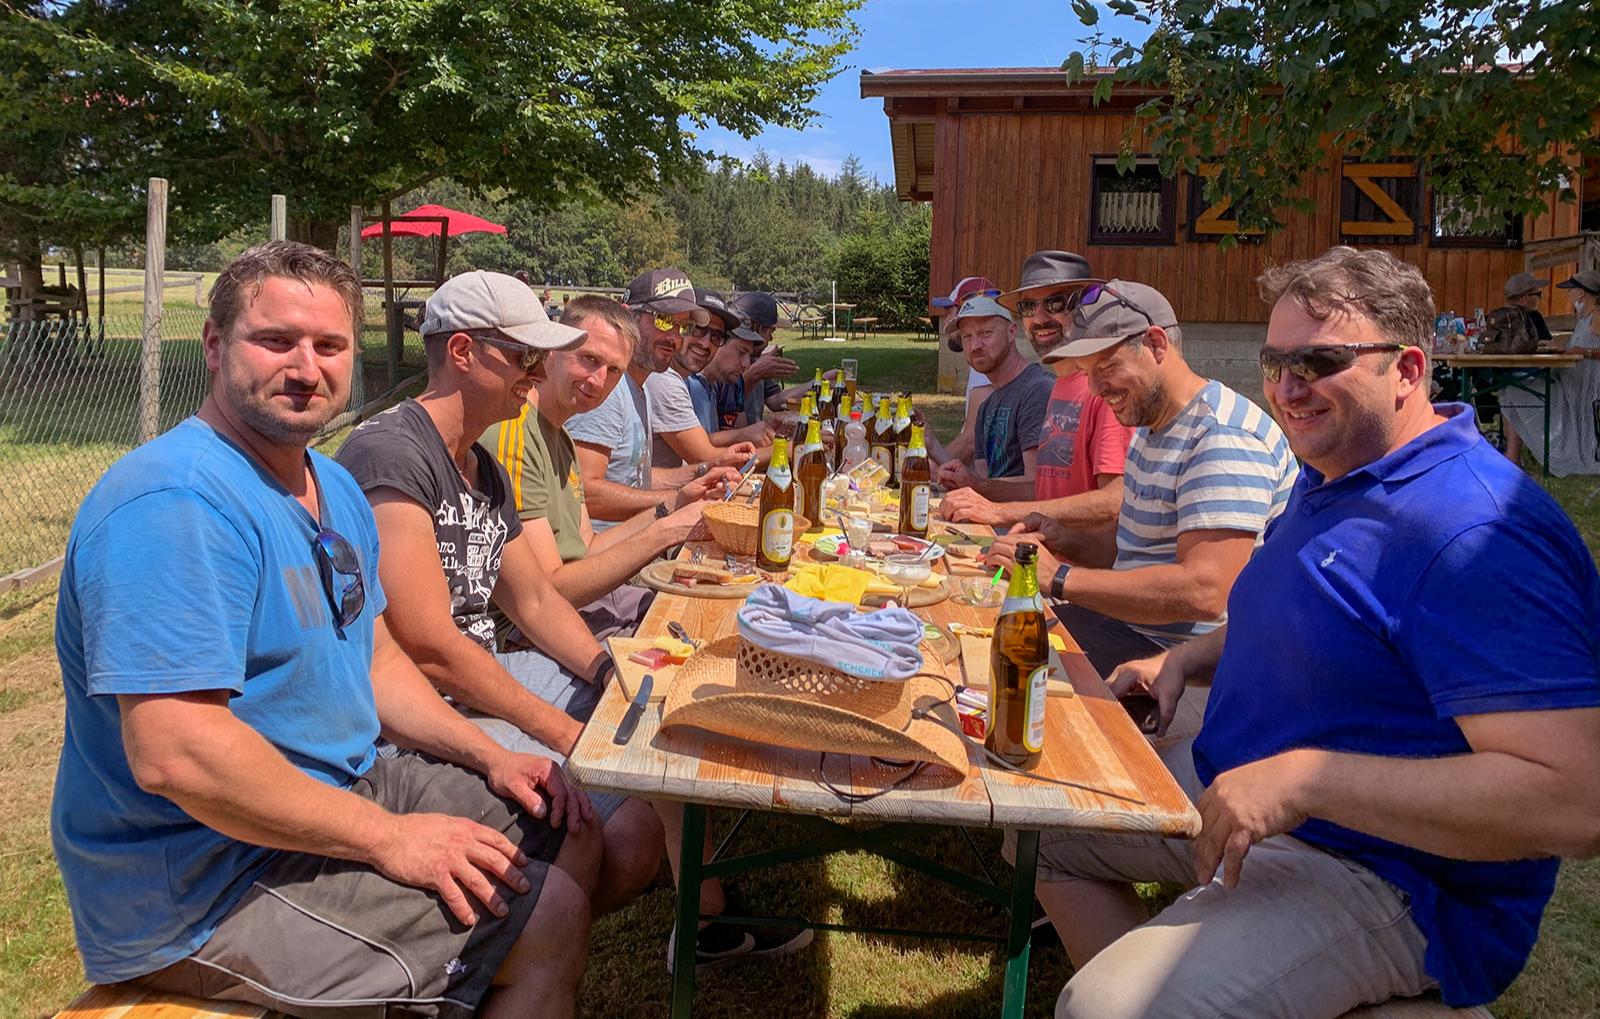 quad-tour-meissenheim-bg5